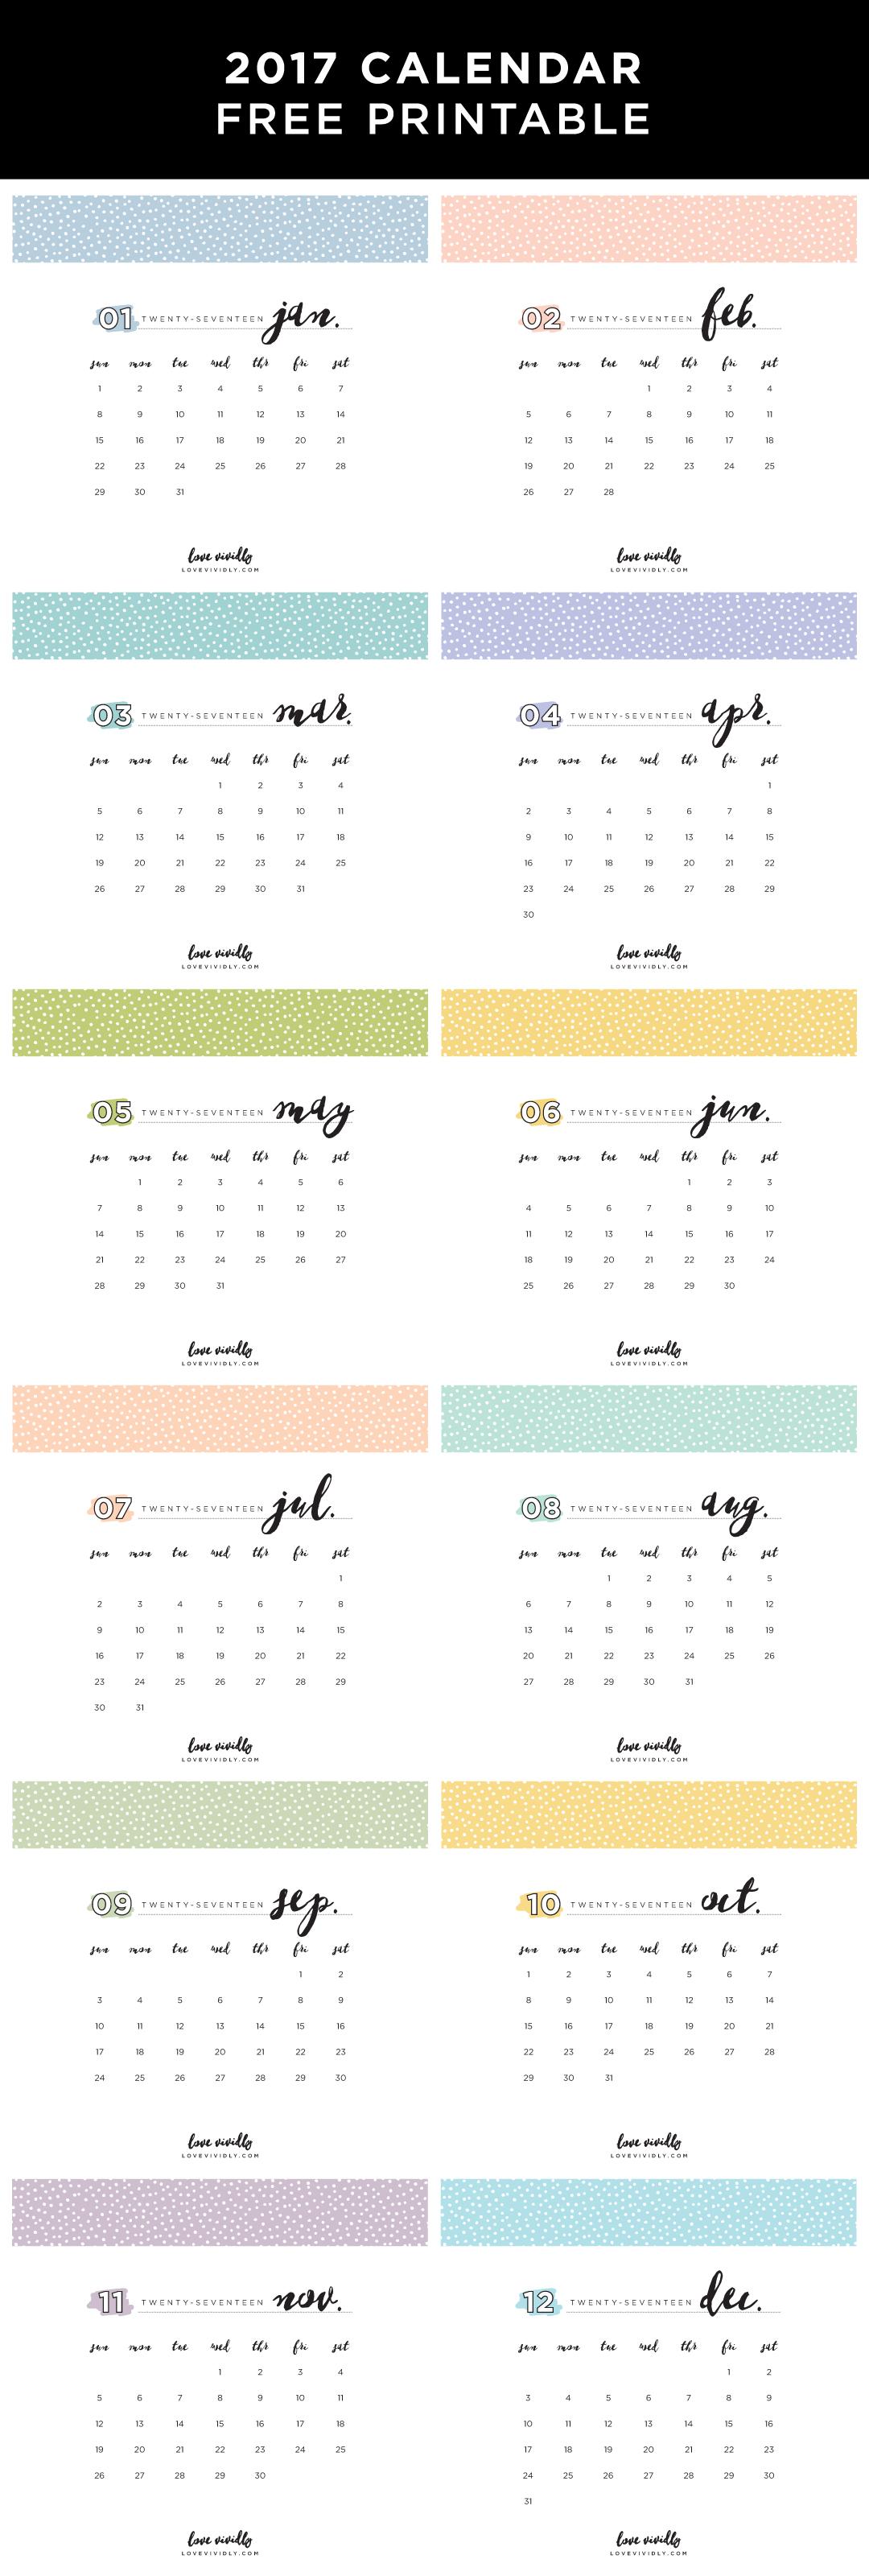 Calendar Free Printable Selling On Etsy